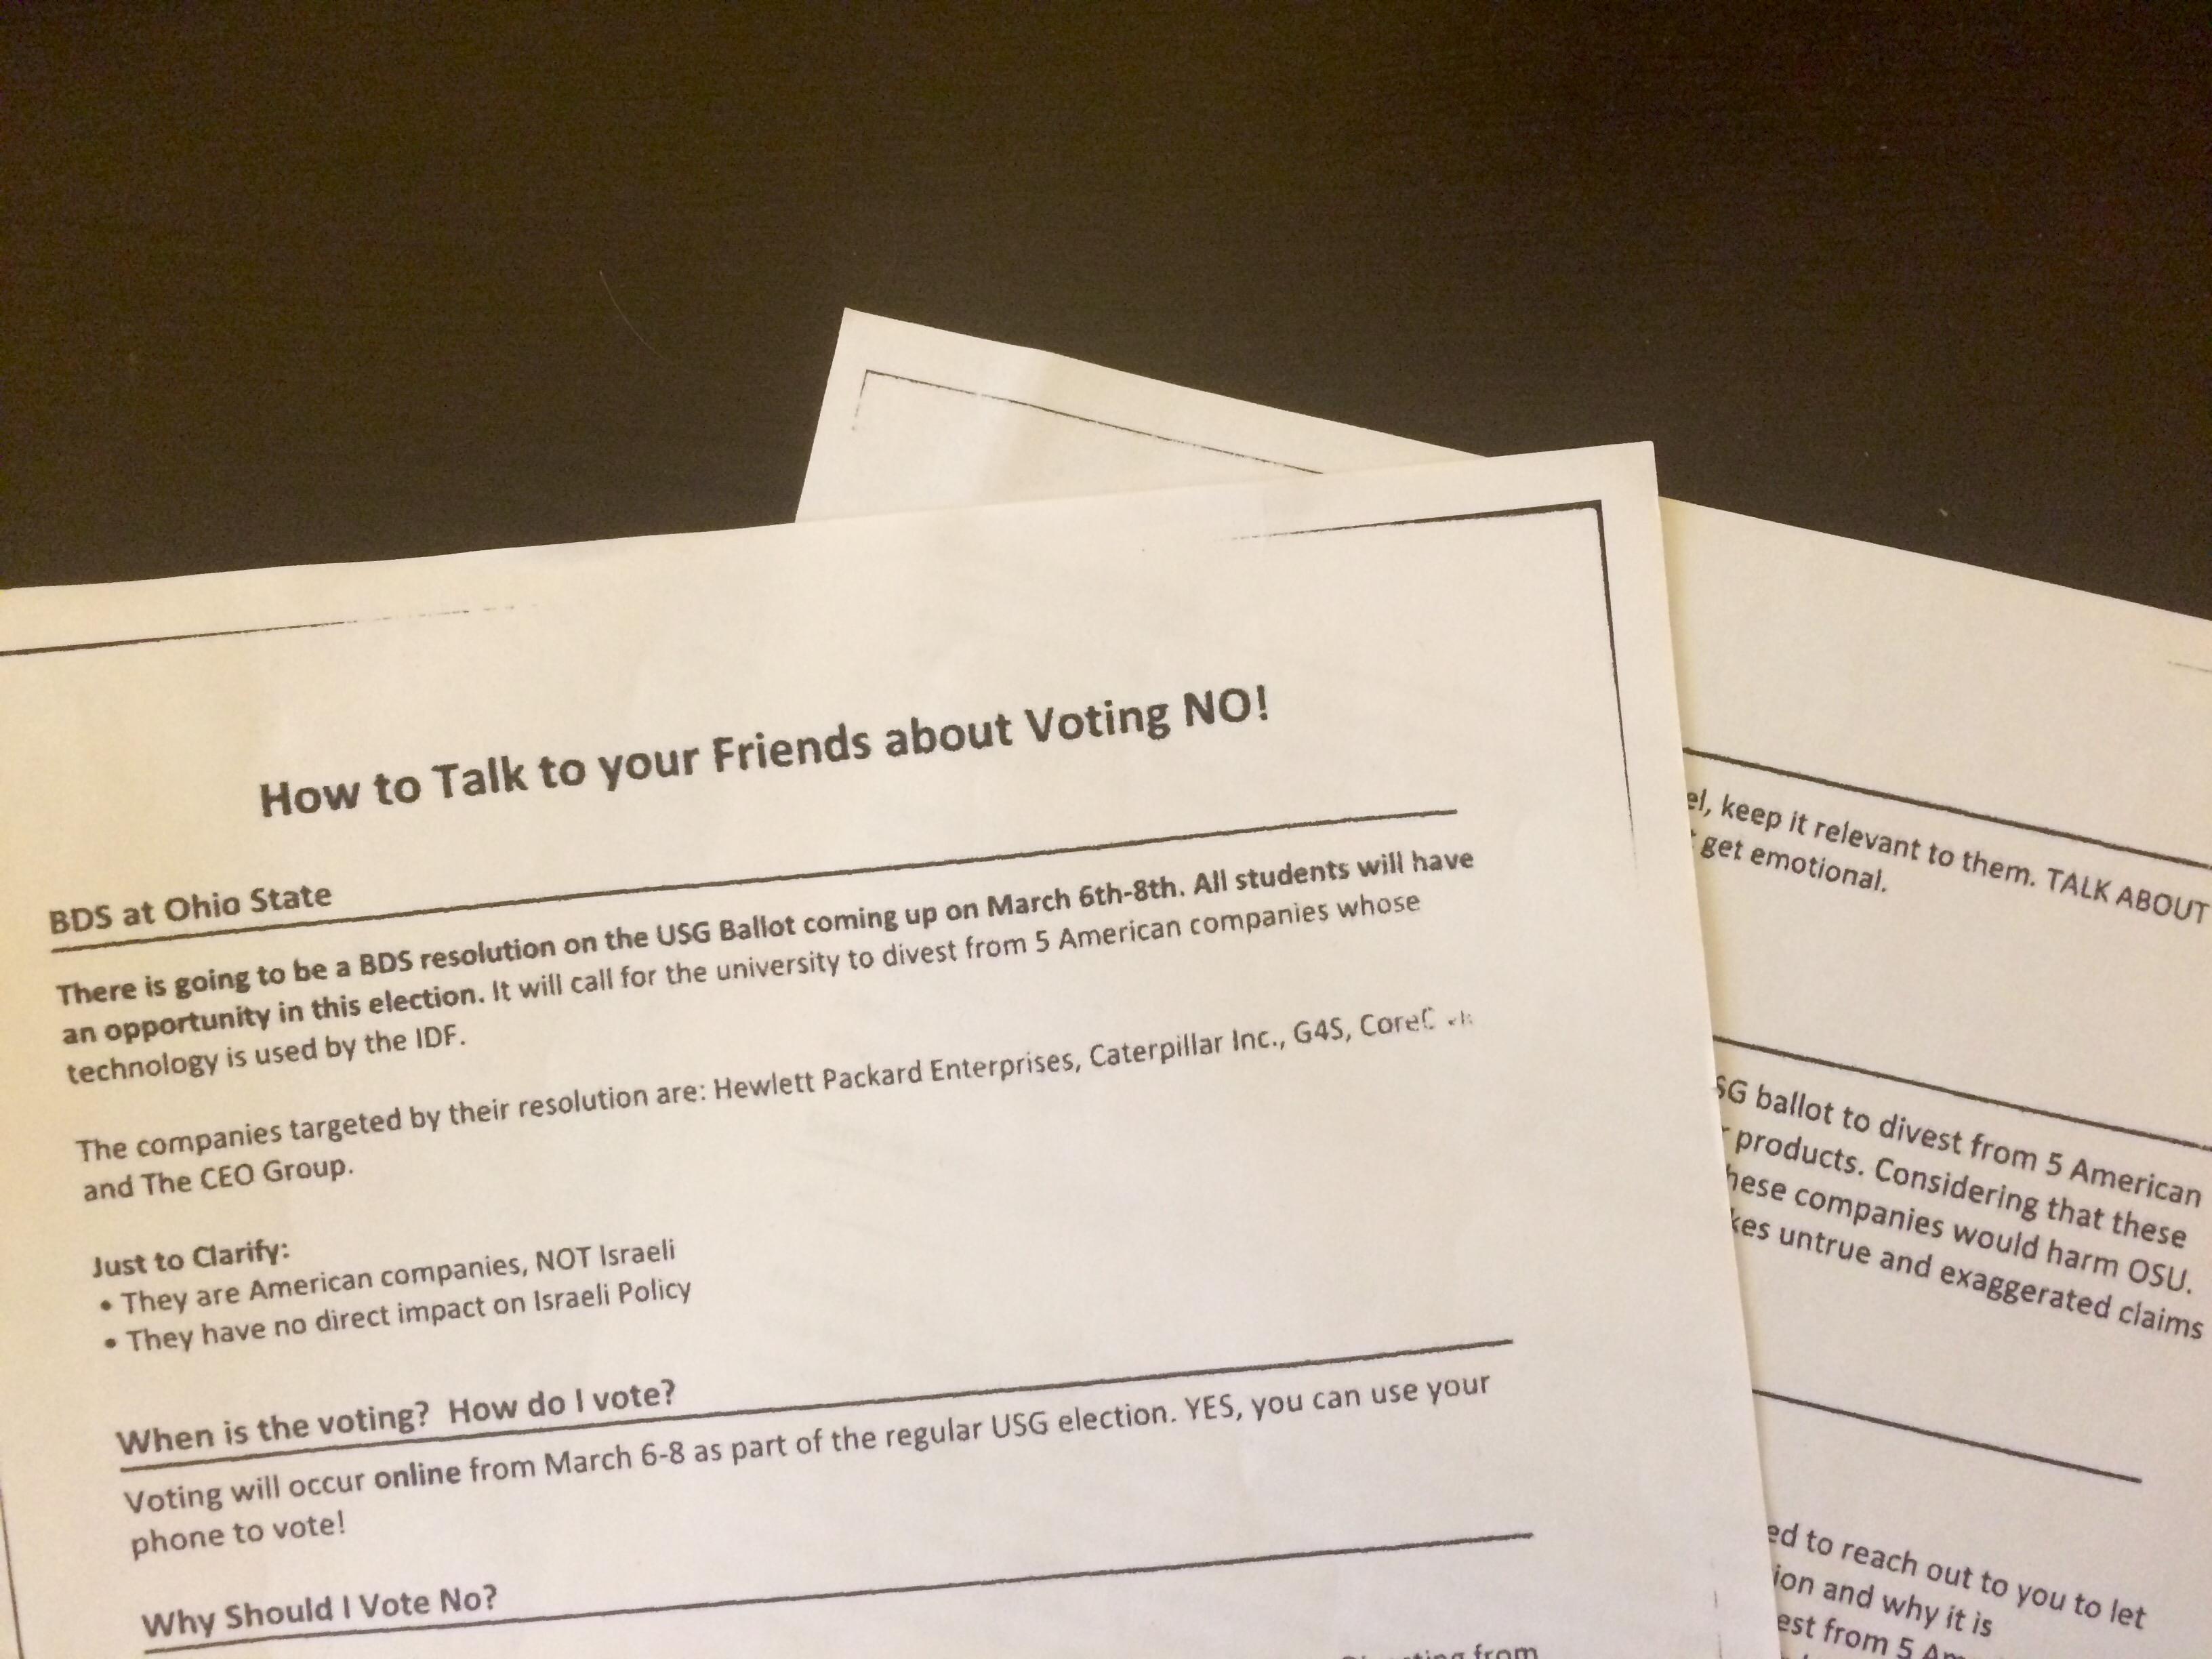 Ohio State Hillel putting weight, staff, money behind USG ballot ...